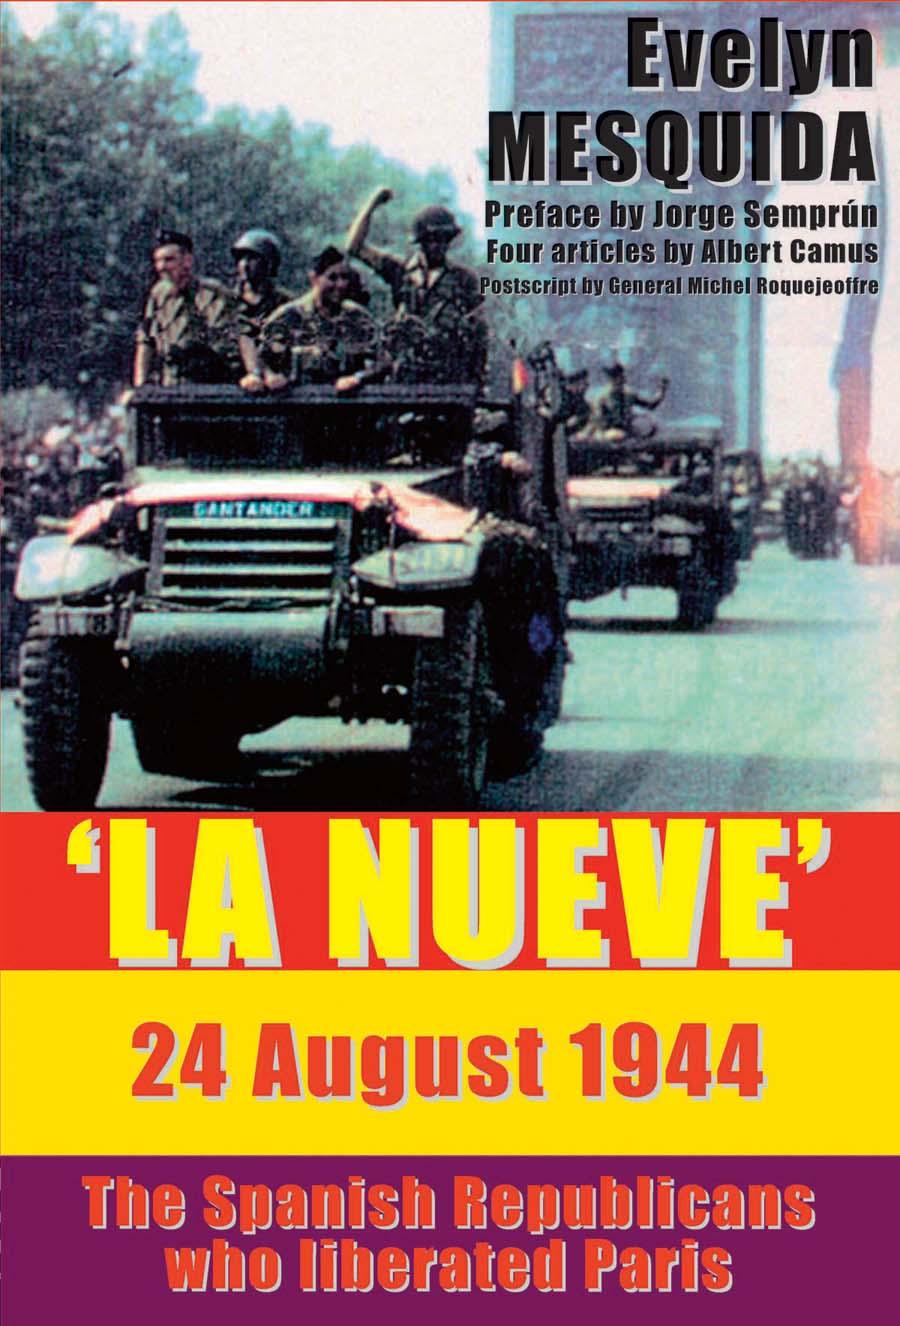 LA NUEVE 24 August, 1944 The Spaniards Who Liberated Paris